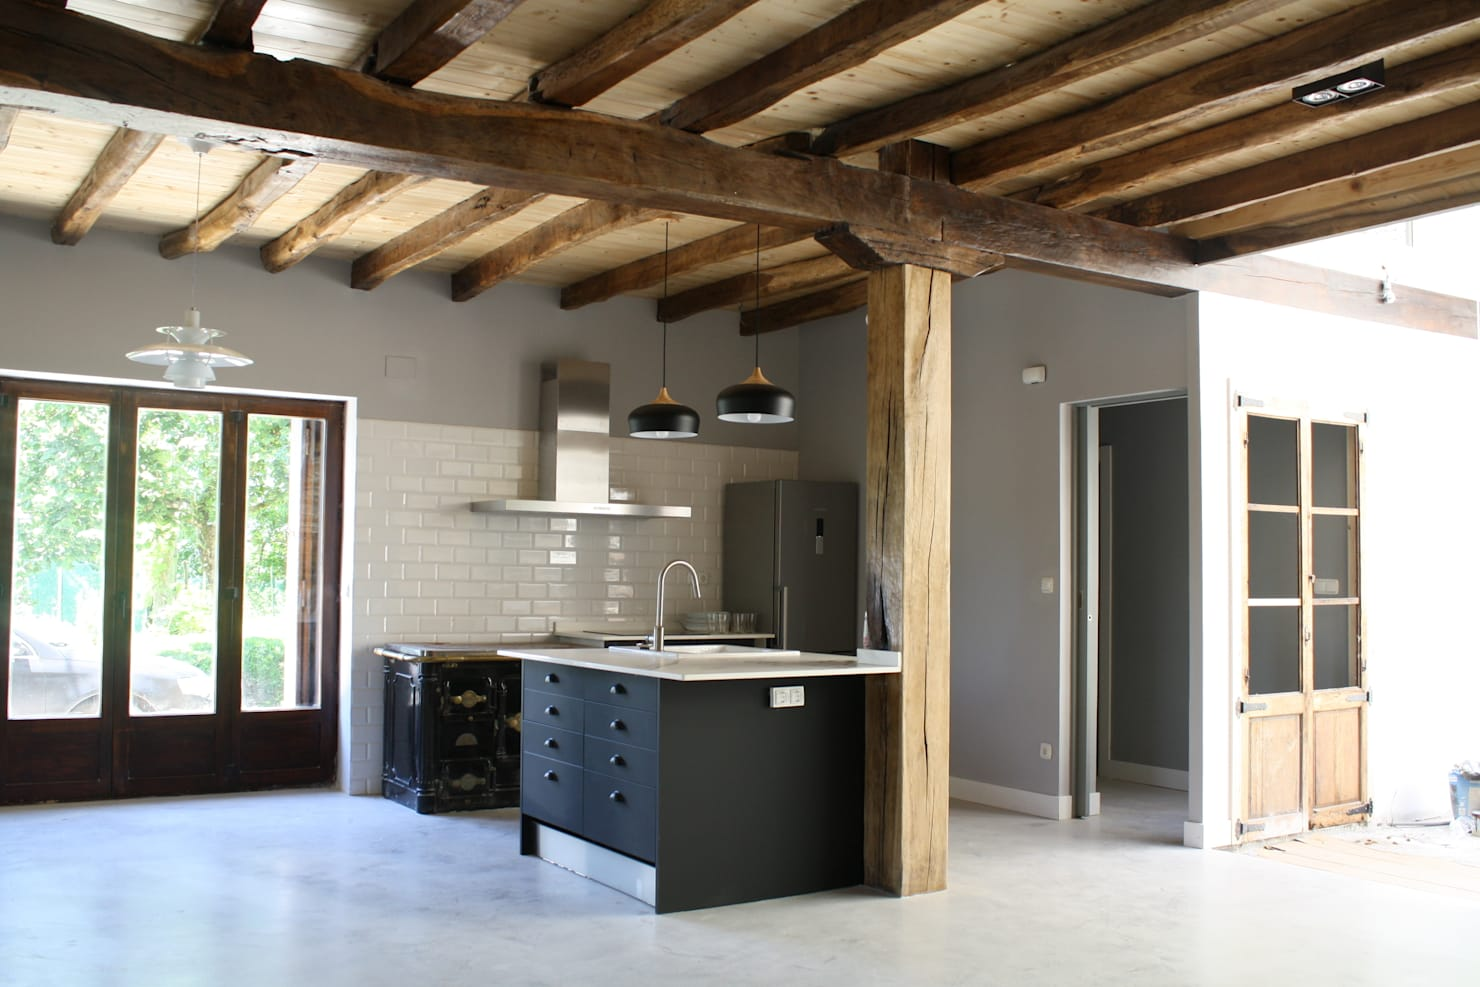 10 spectacular wooden beam finishing ideas!